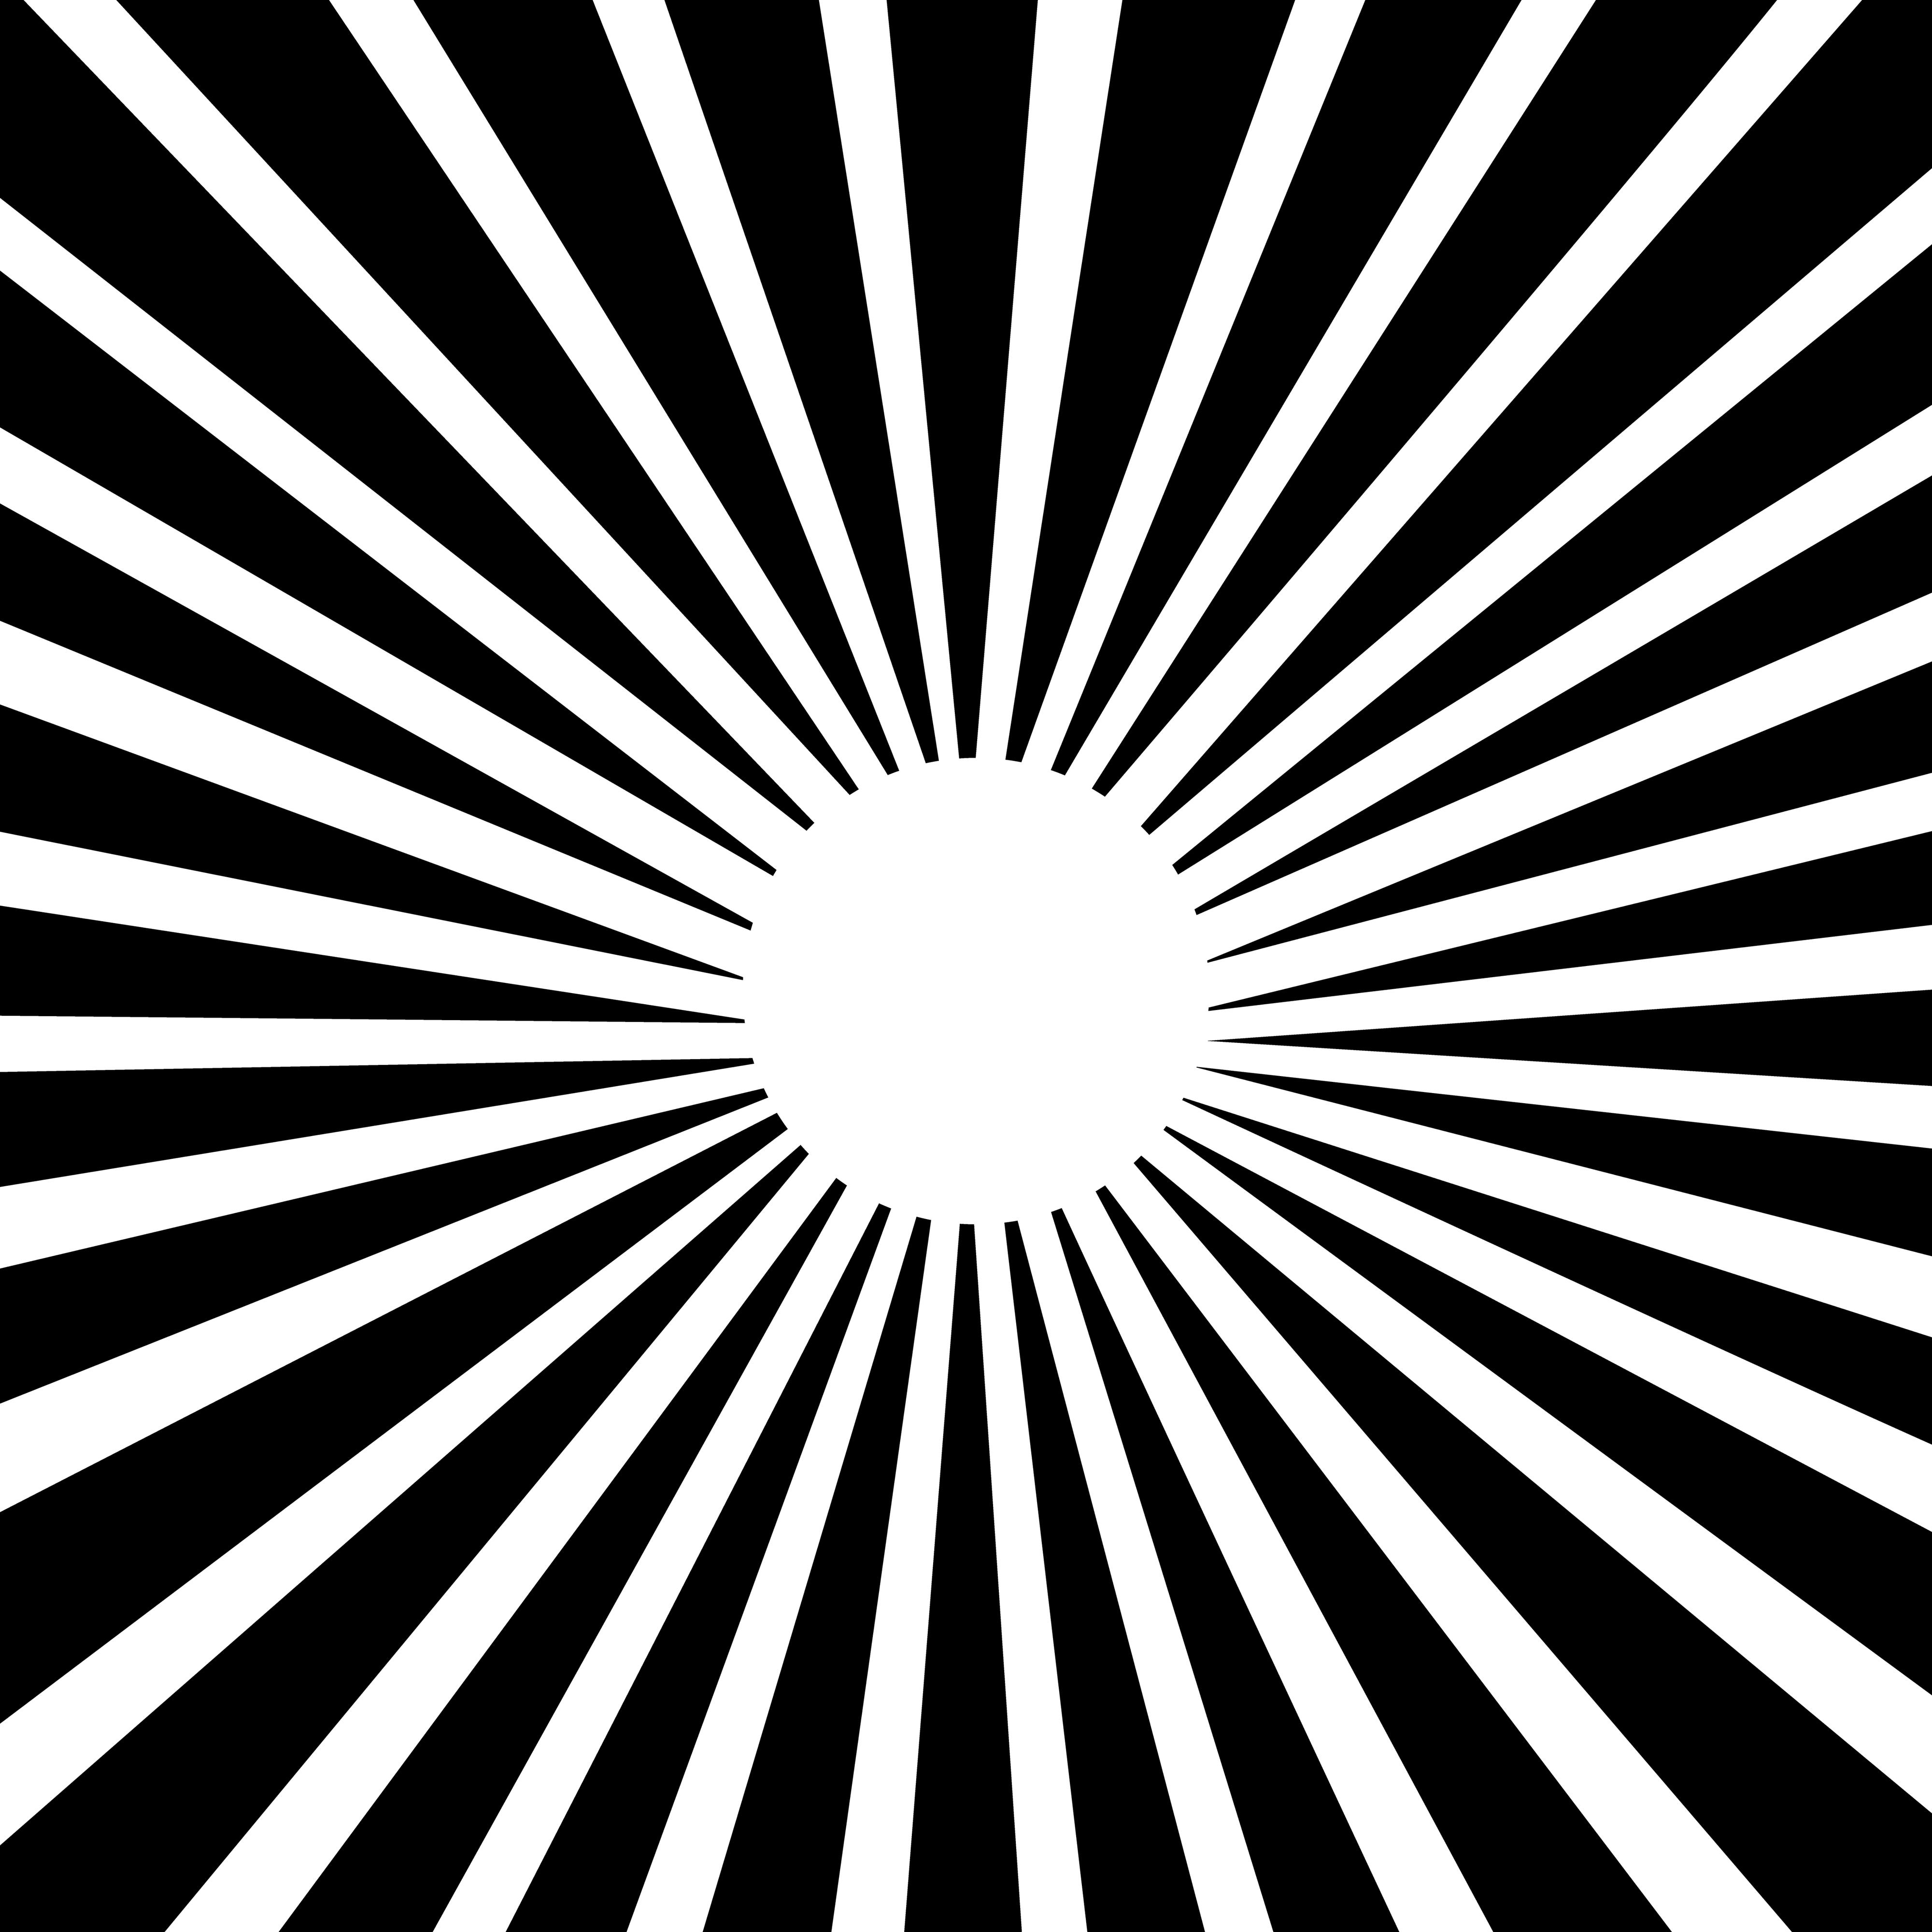 Awesome design digital collection. Burst clipart black